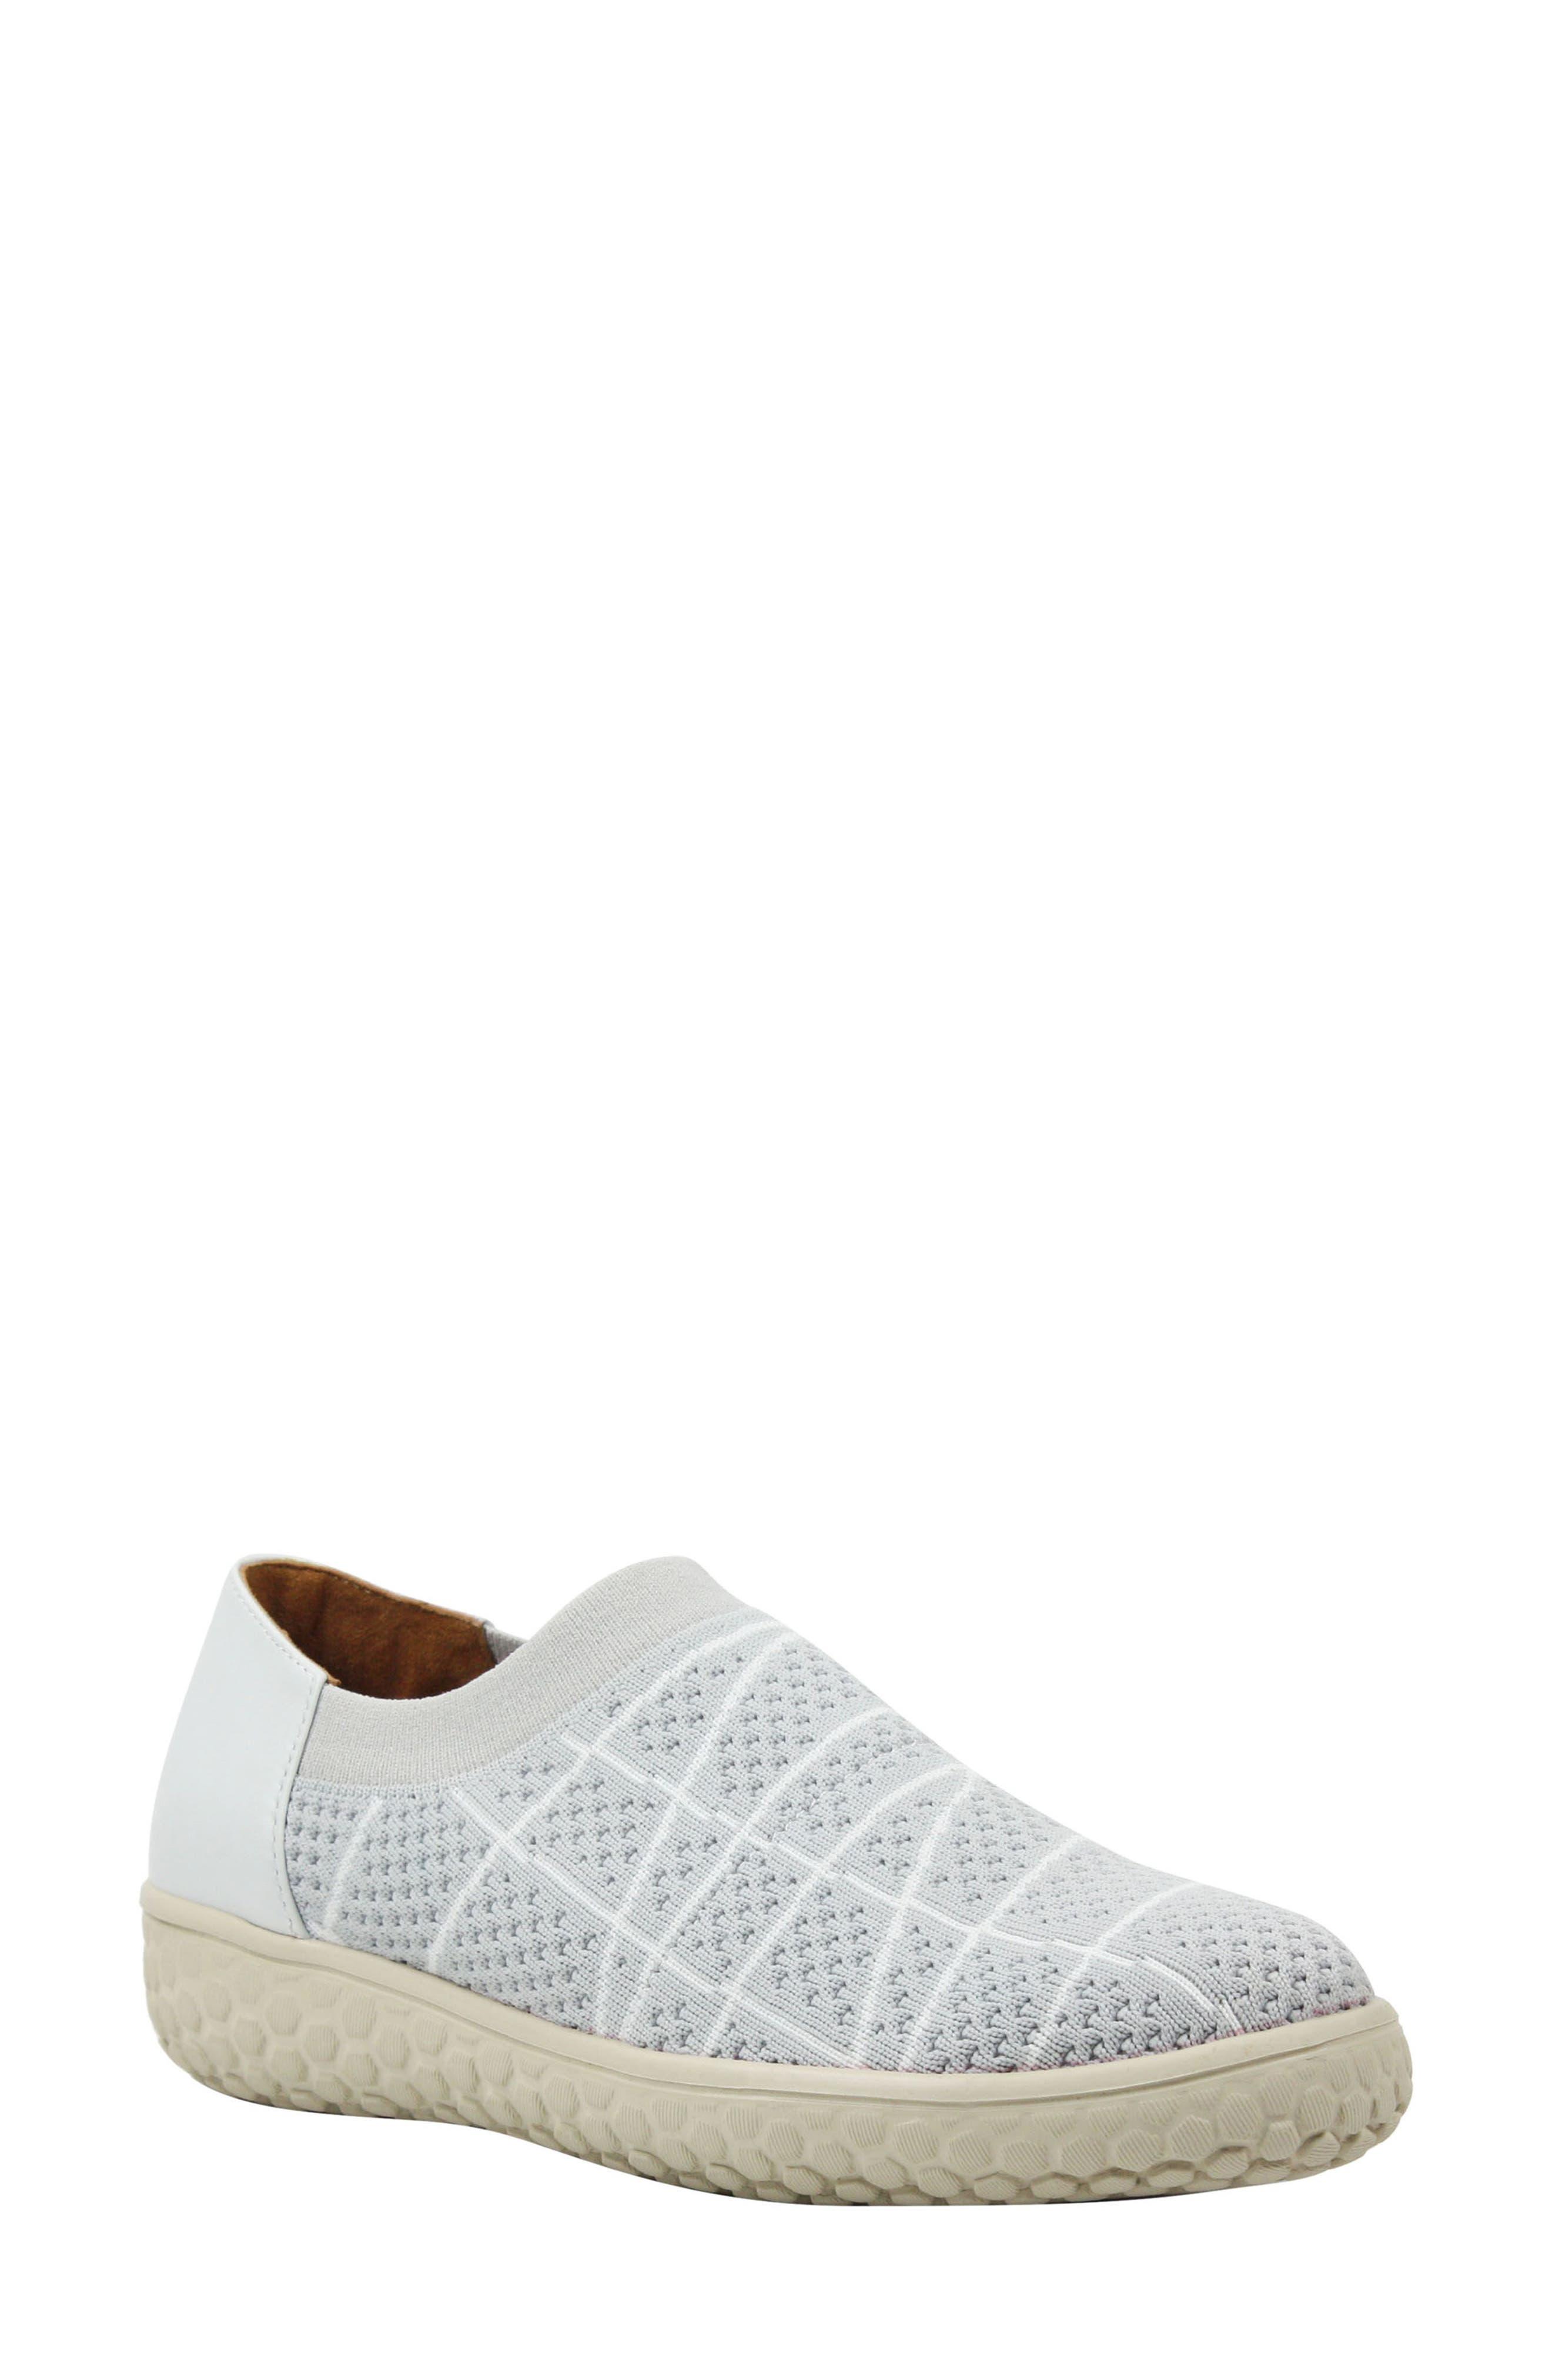 Zohndra Slip-On Sneaker,                         Main,                         color, Beige Fabric